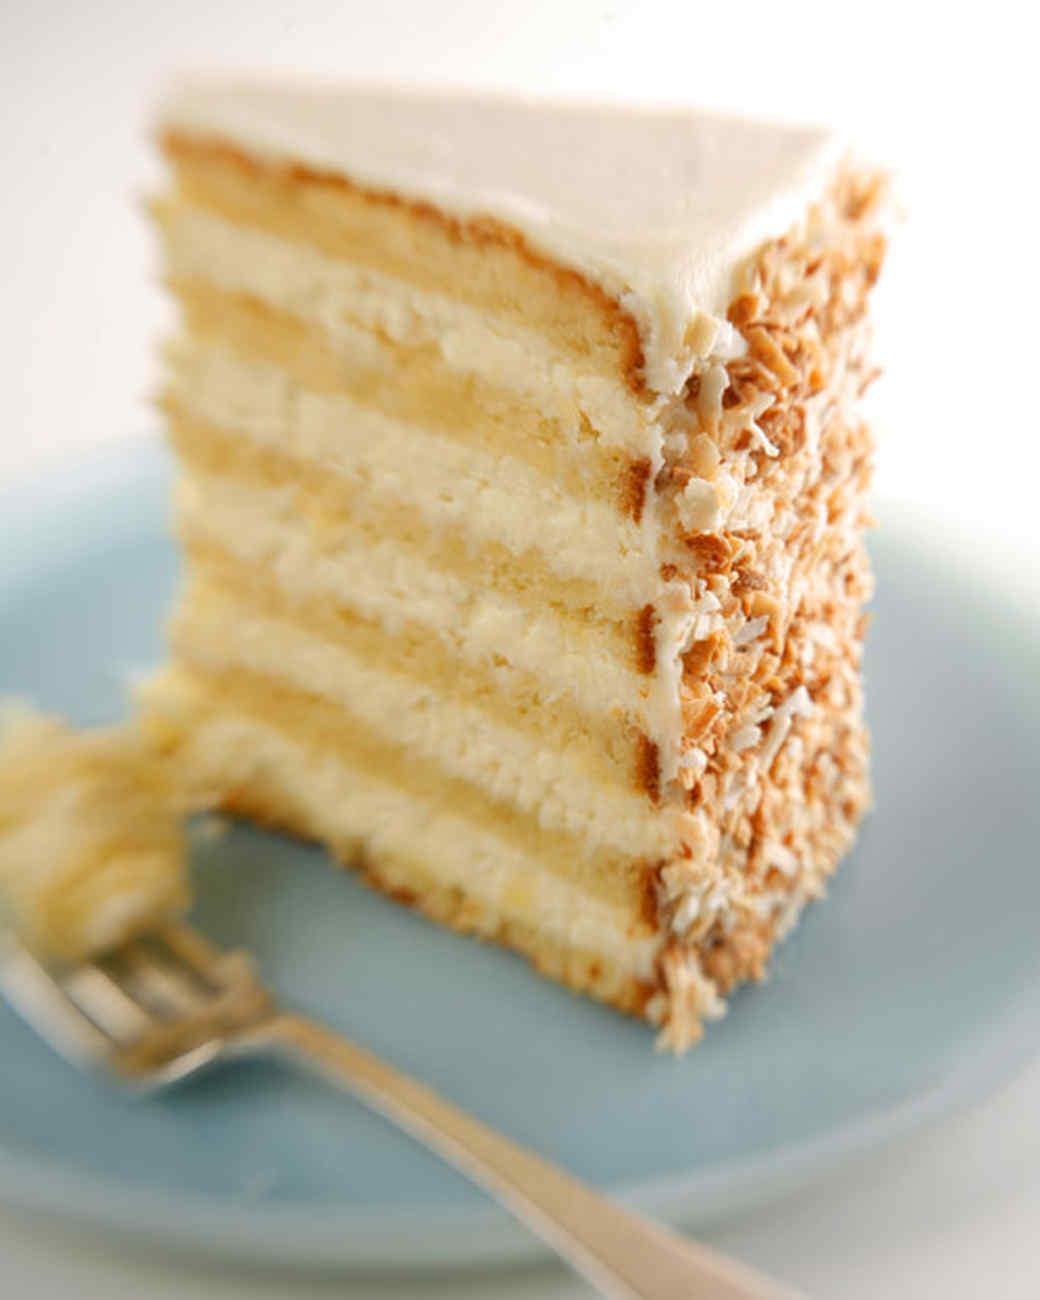 Coconut cake recipe from a box